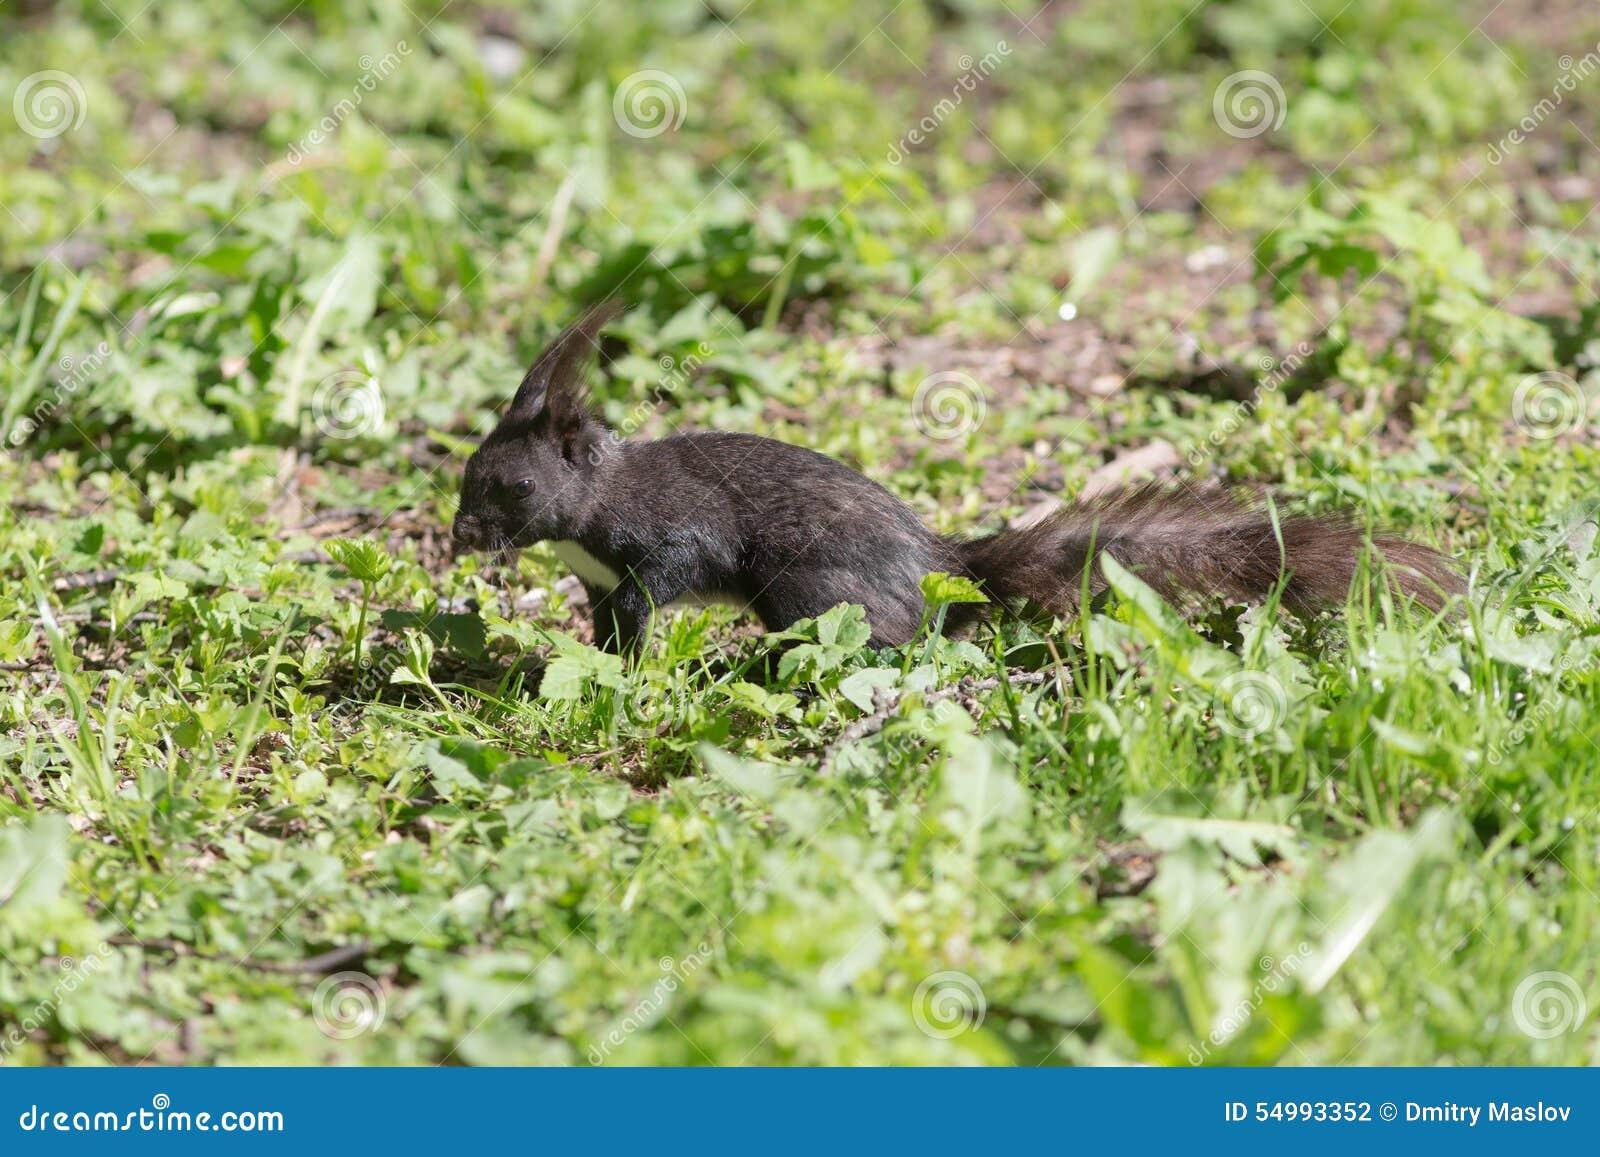 Eekhoorn met donker bont